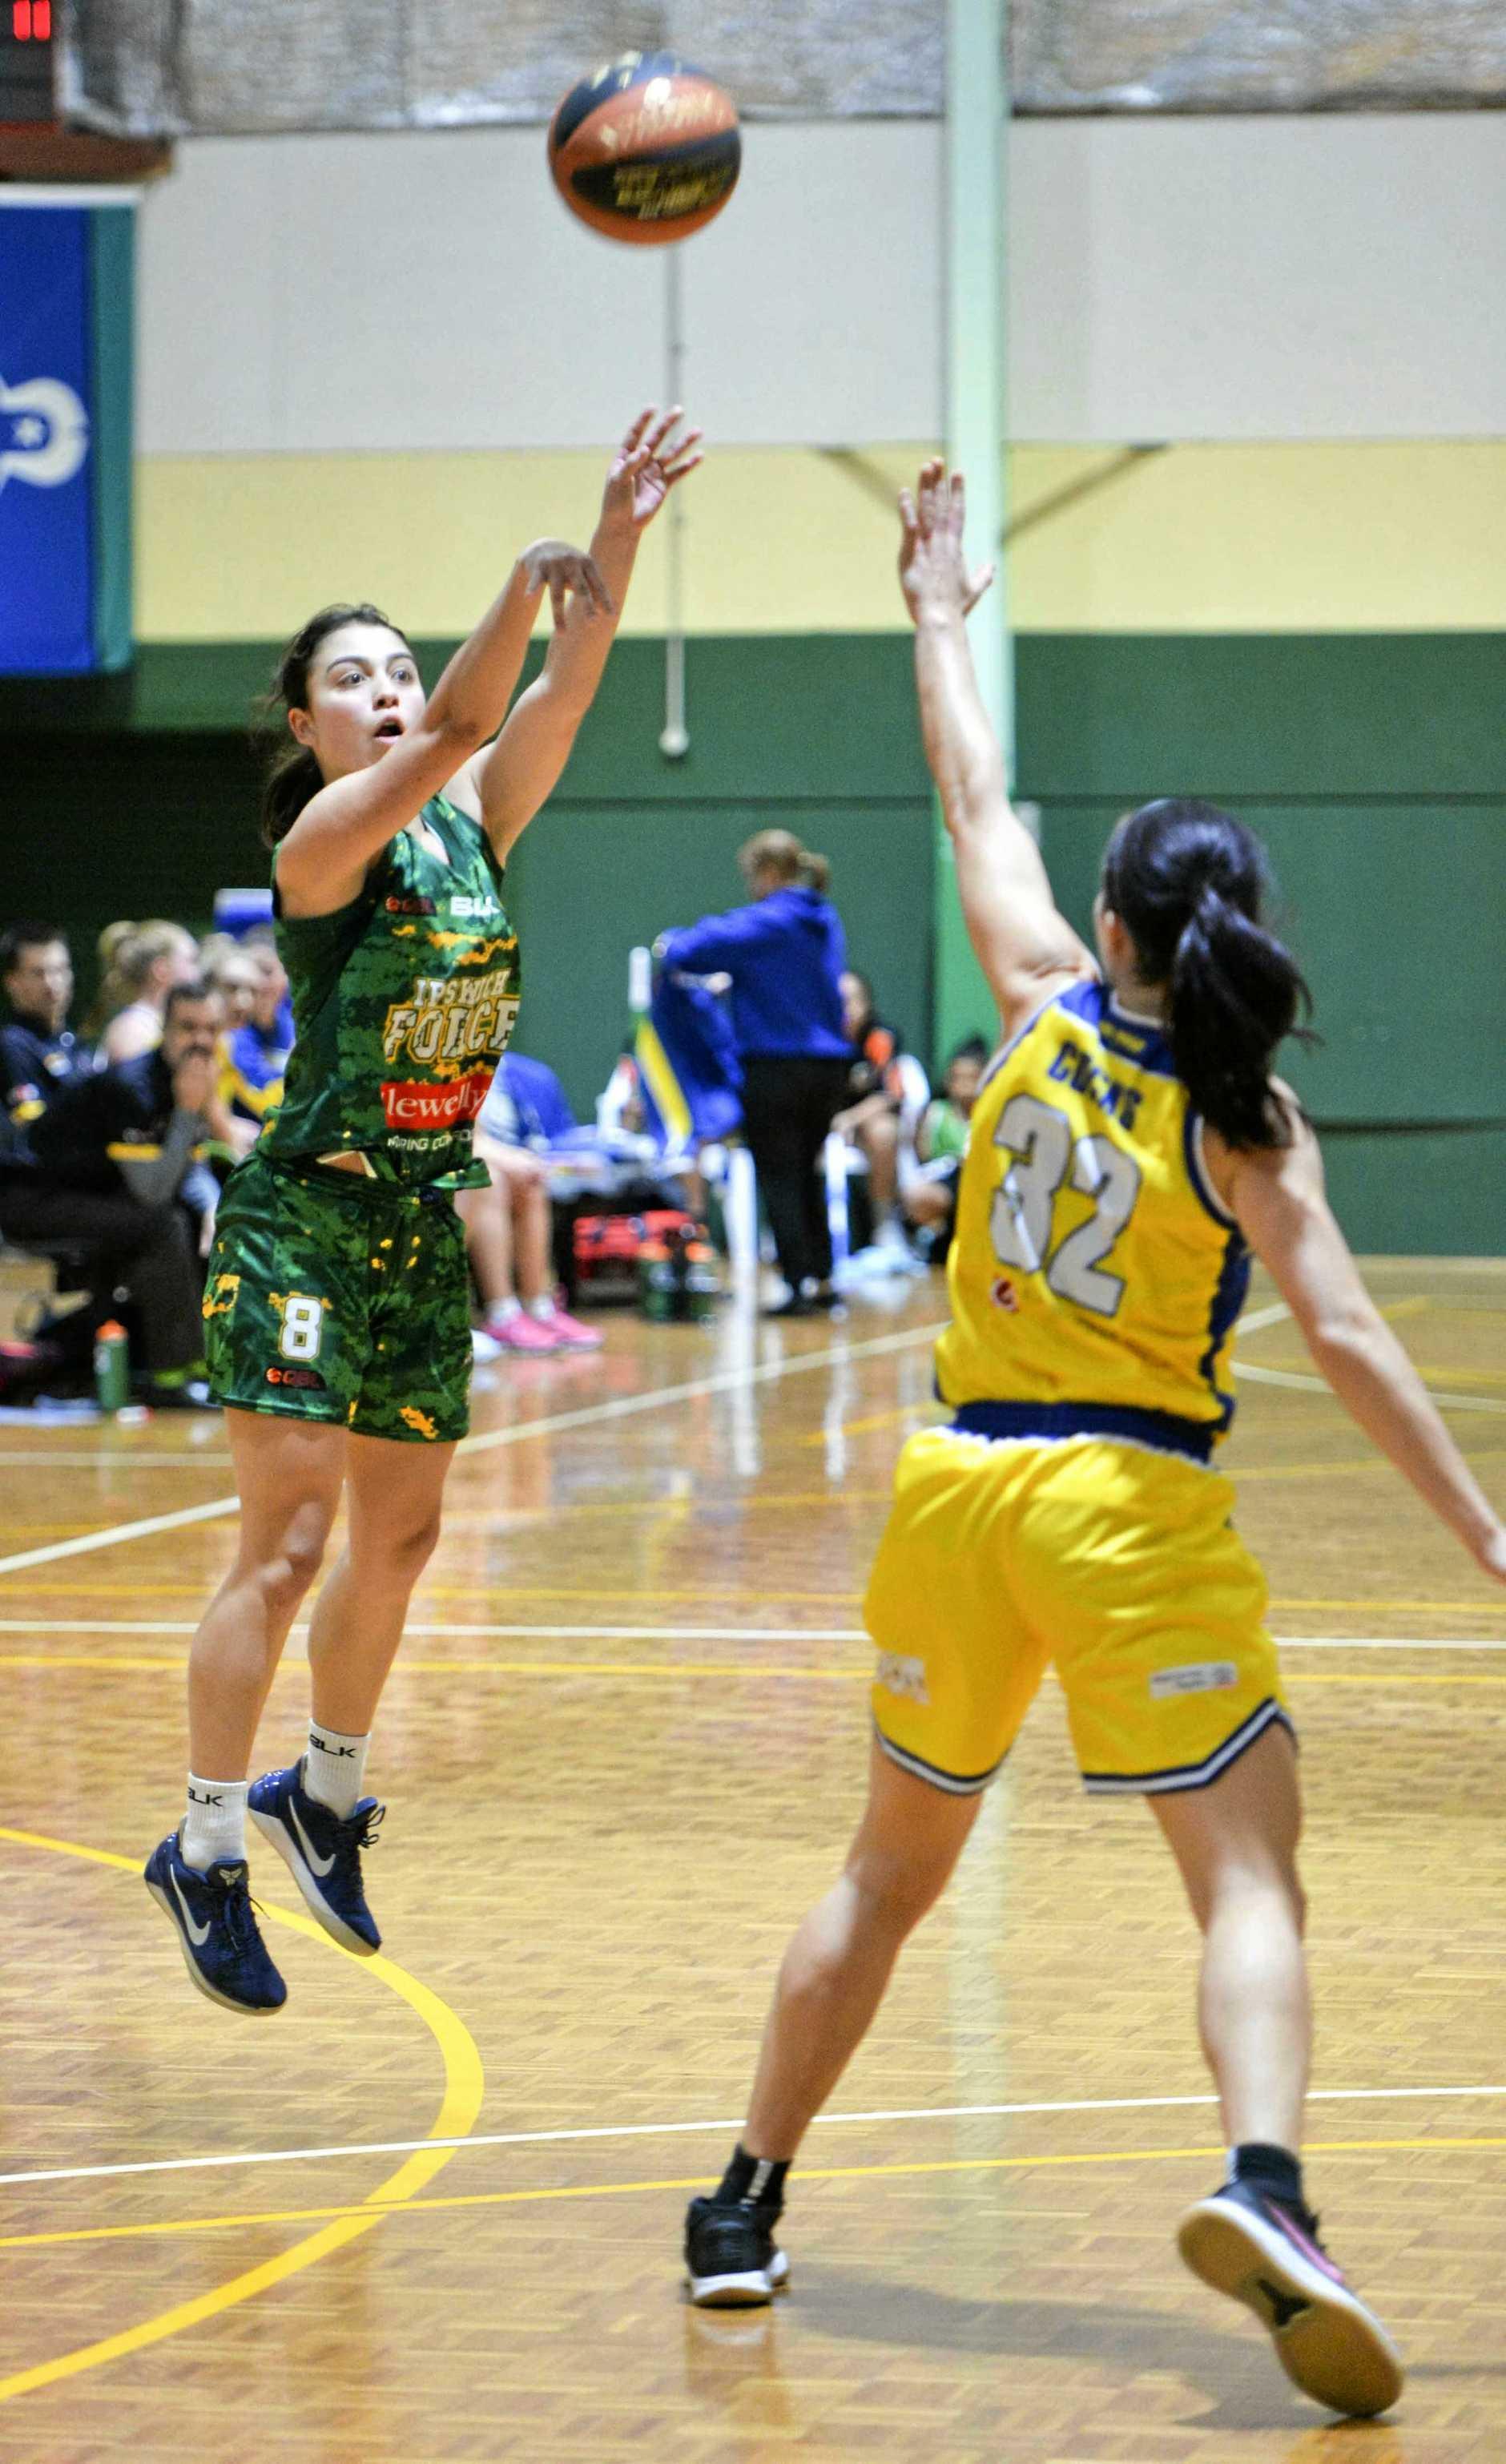 Queensland Basketball League match between Ipswich Force and Townsville Flames. Ipswich's Kate Head